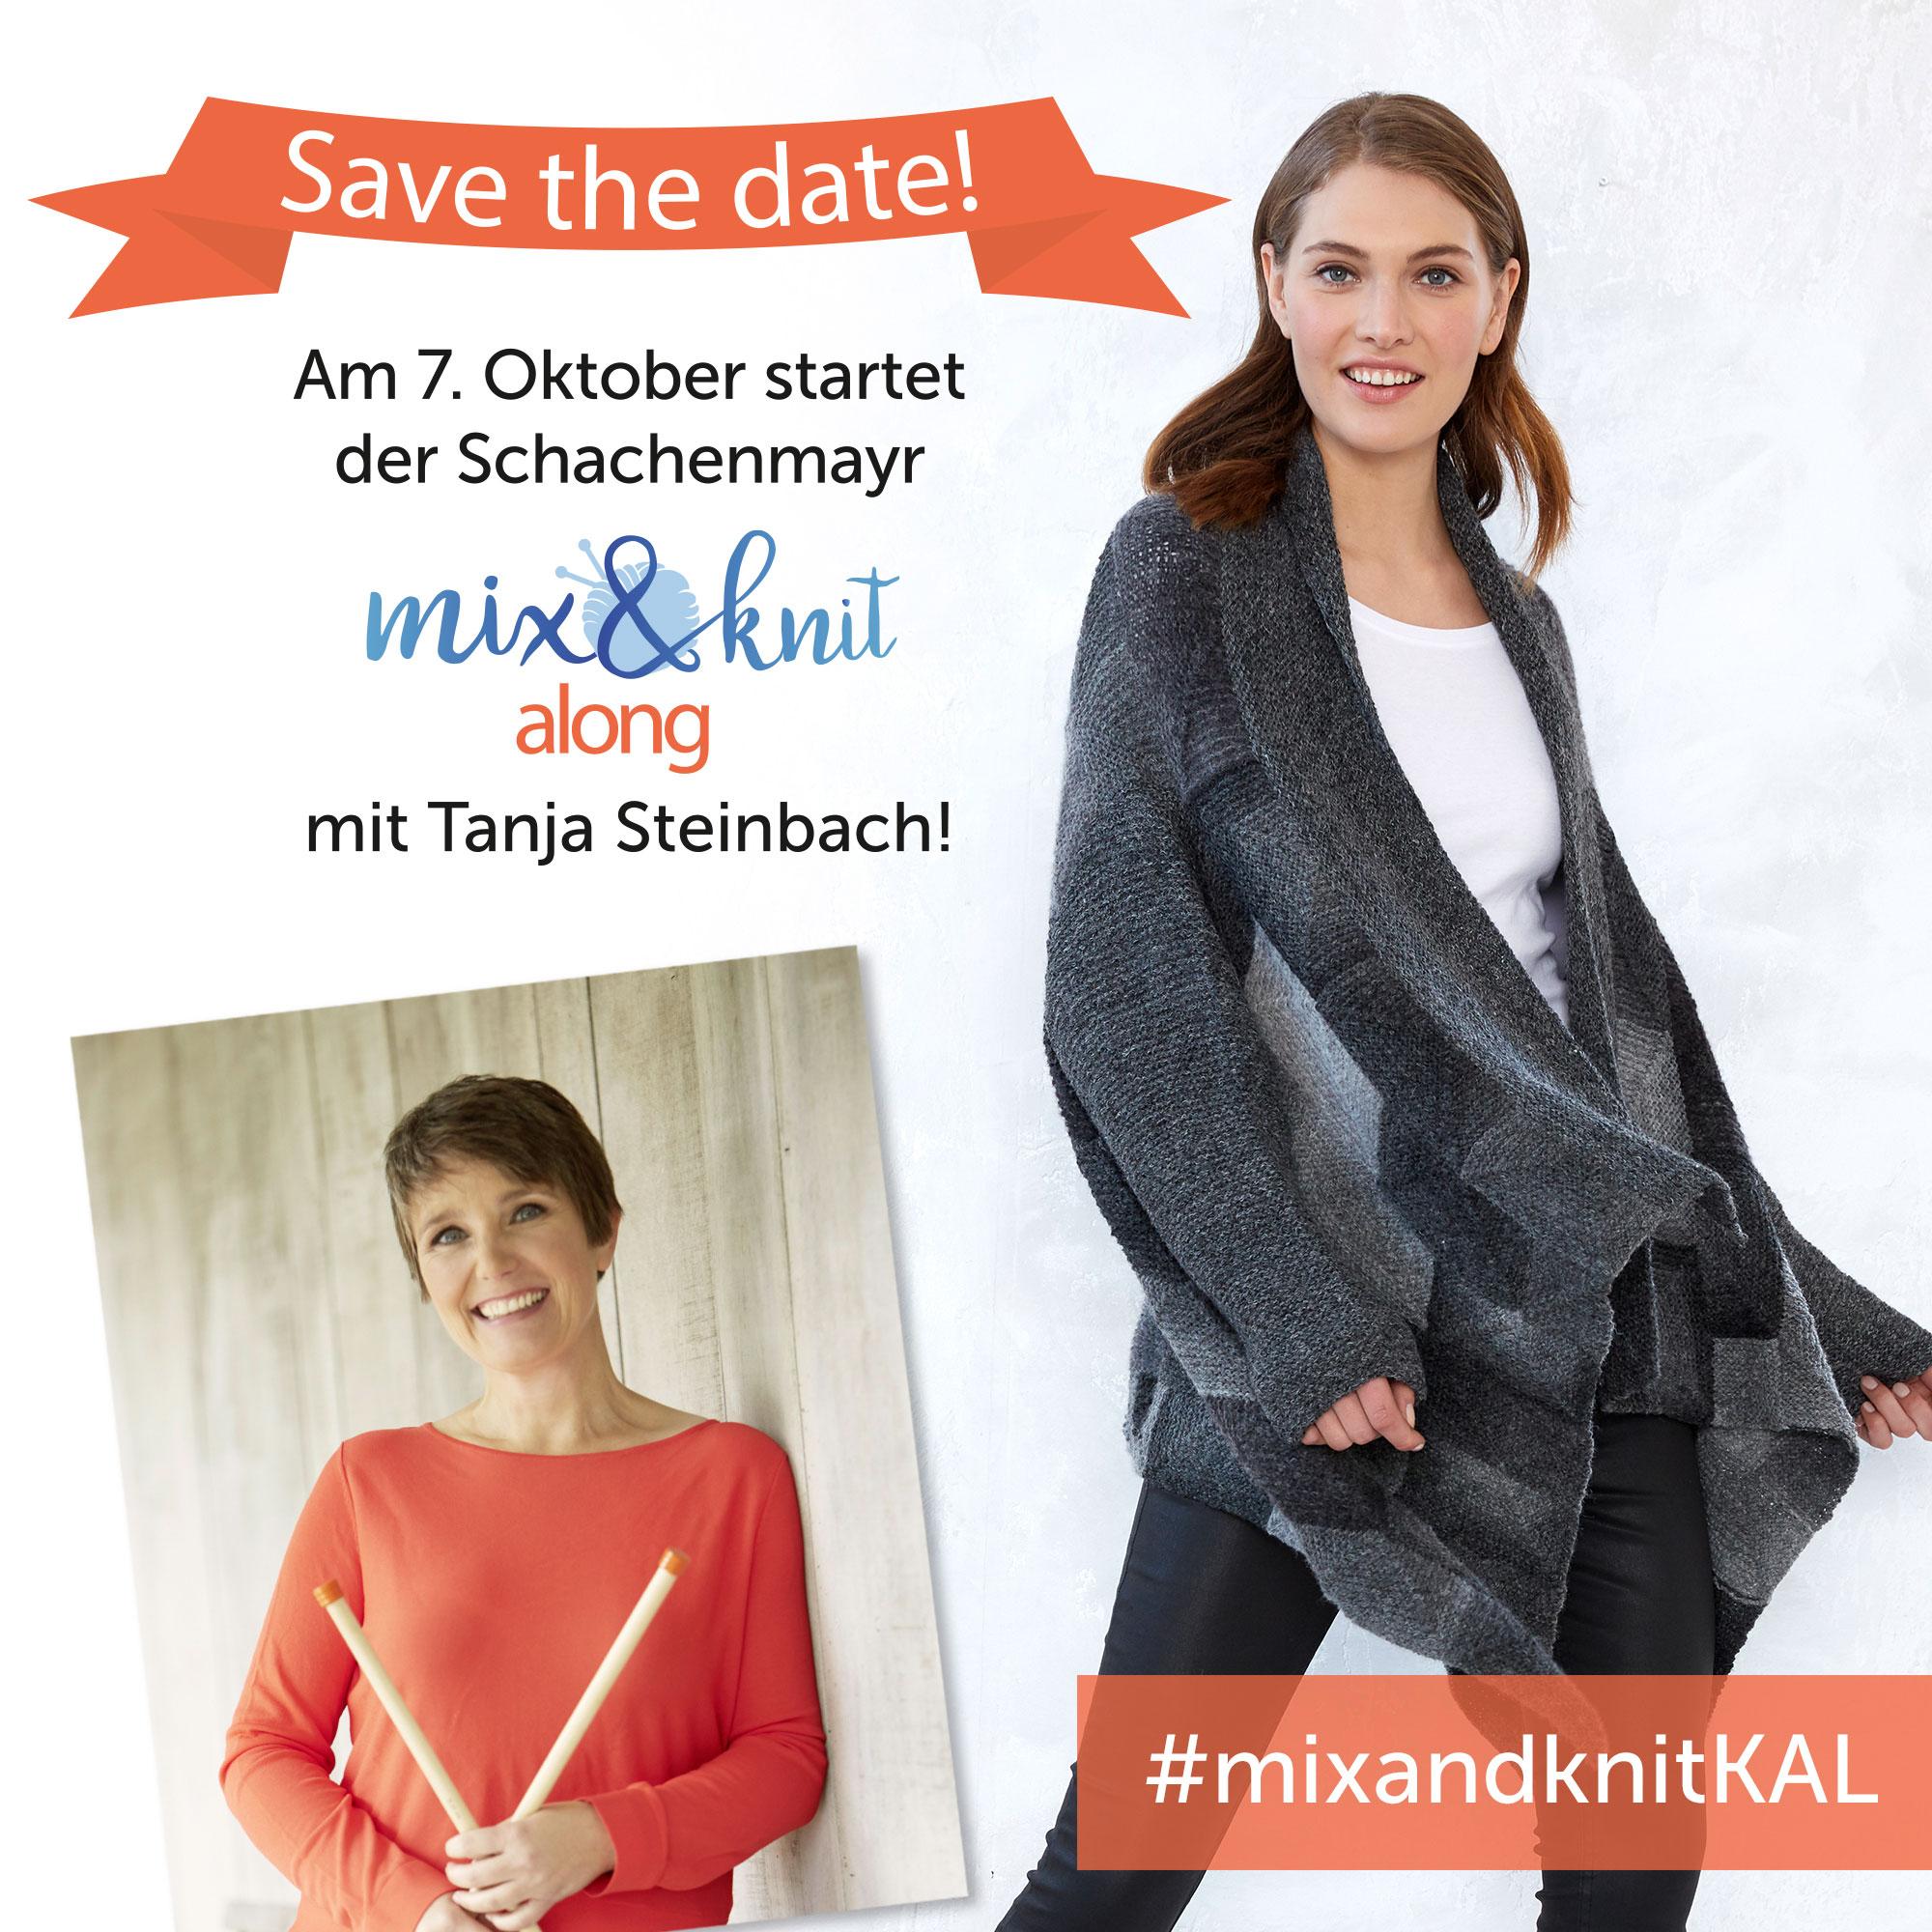 Am 7. Oktober startet der mix&knit-along mit Tanja Steinbach